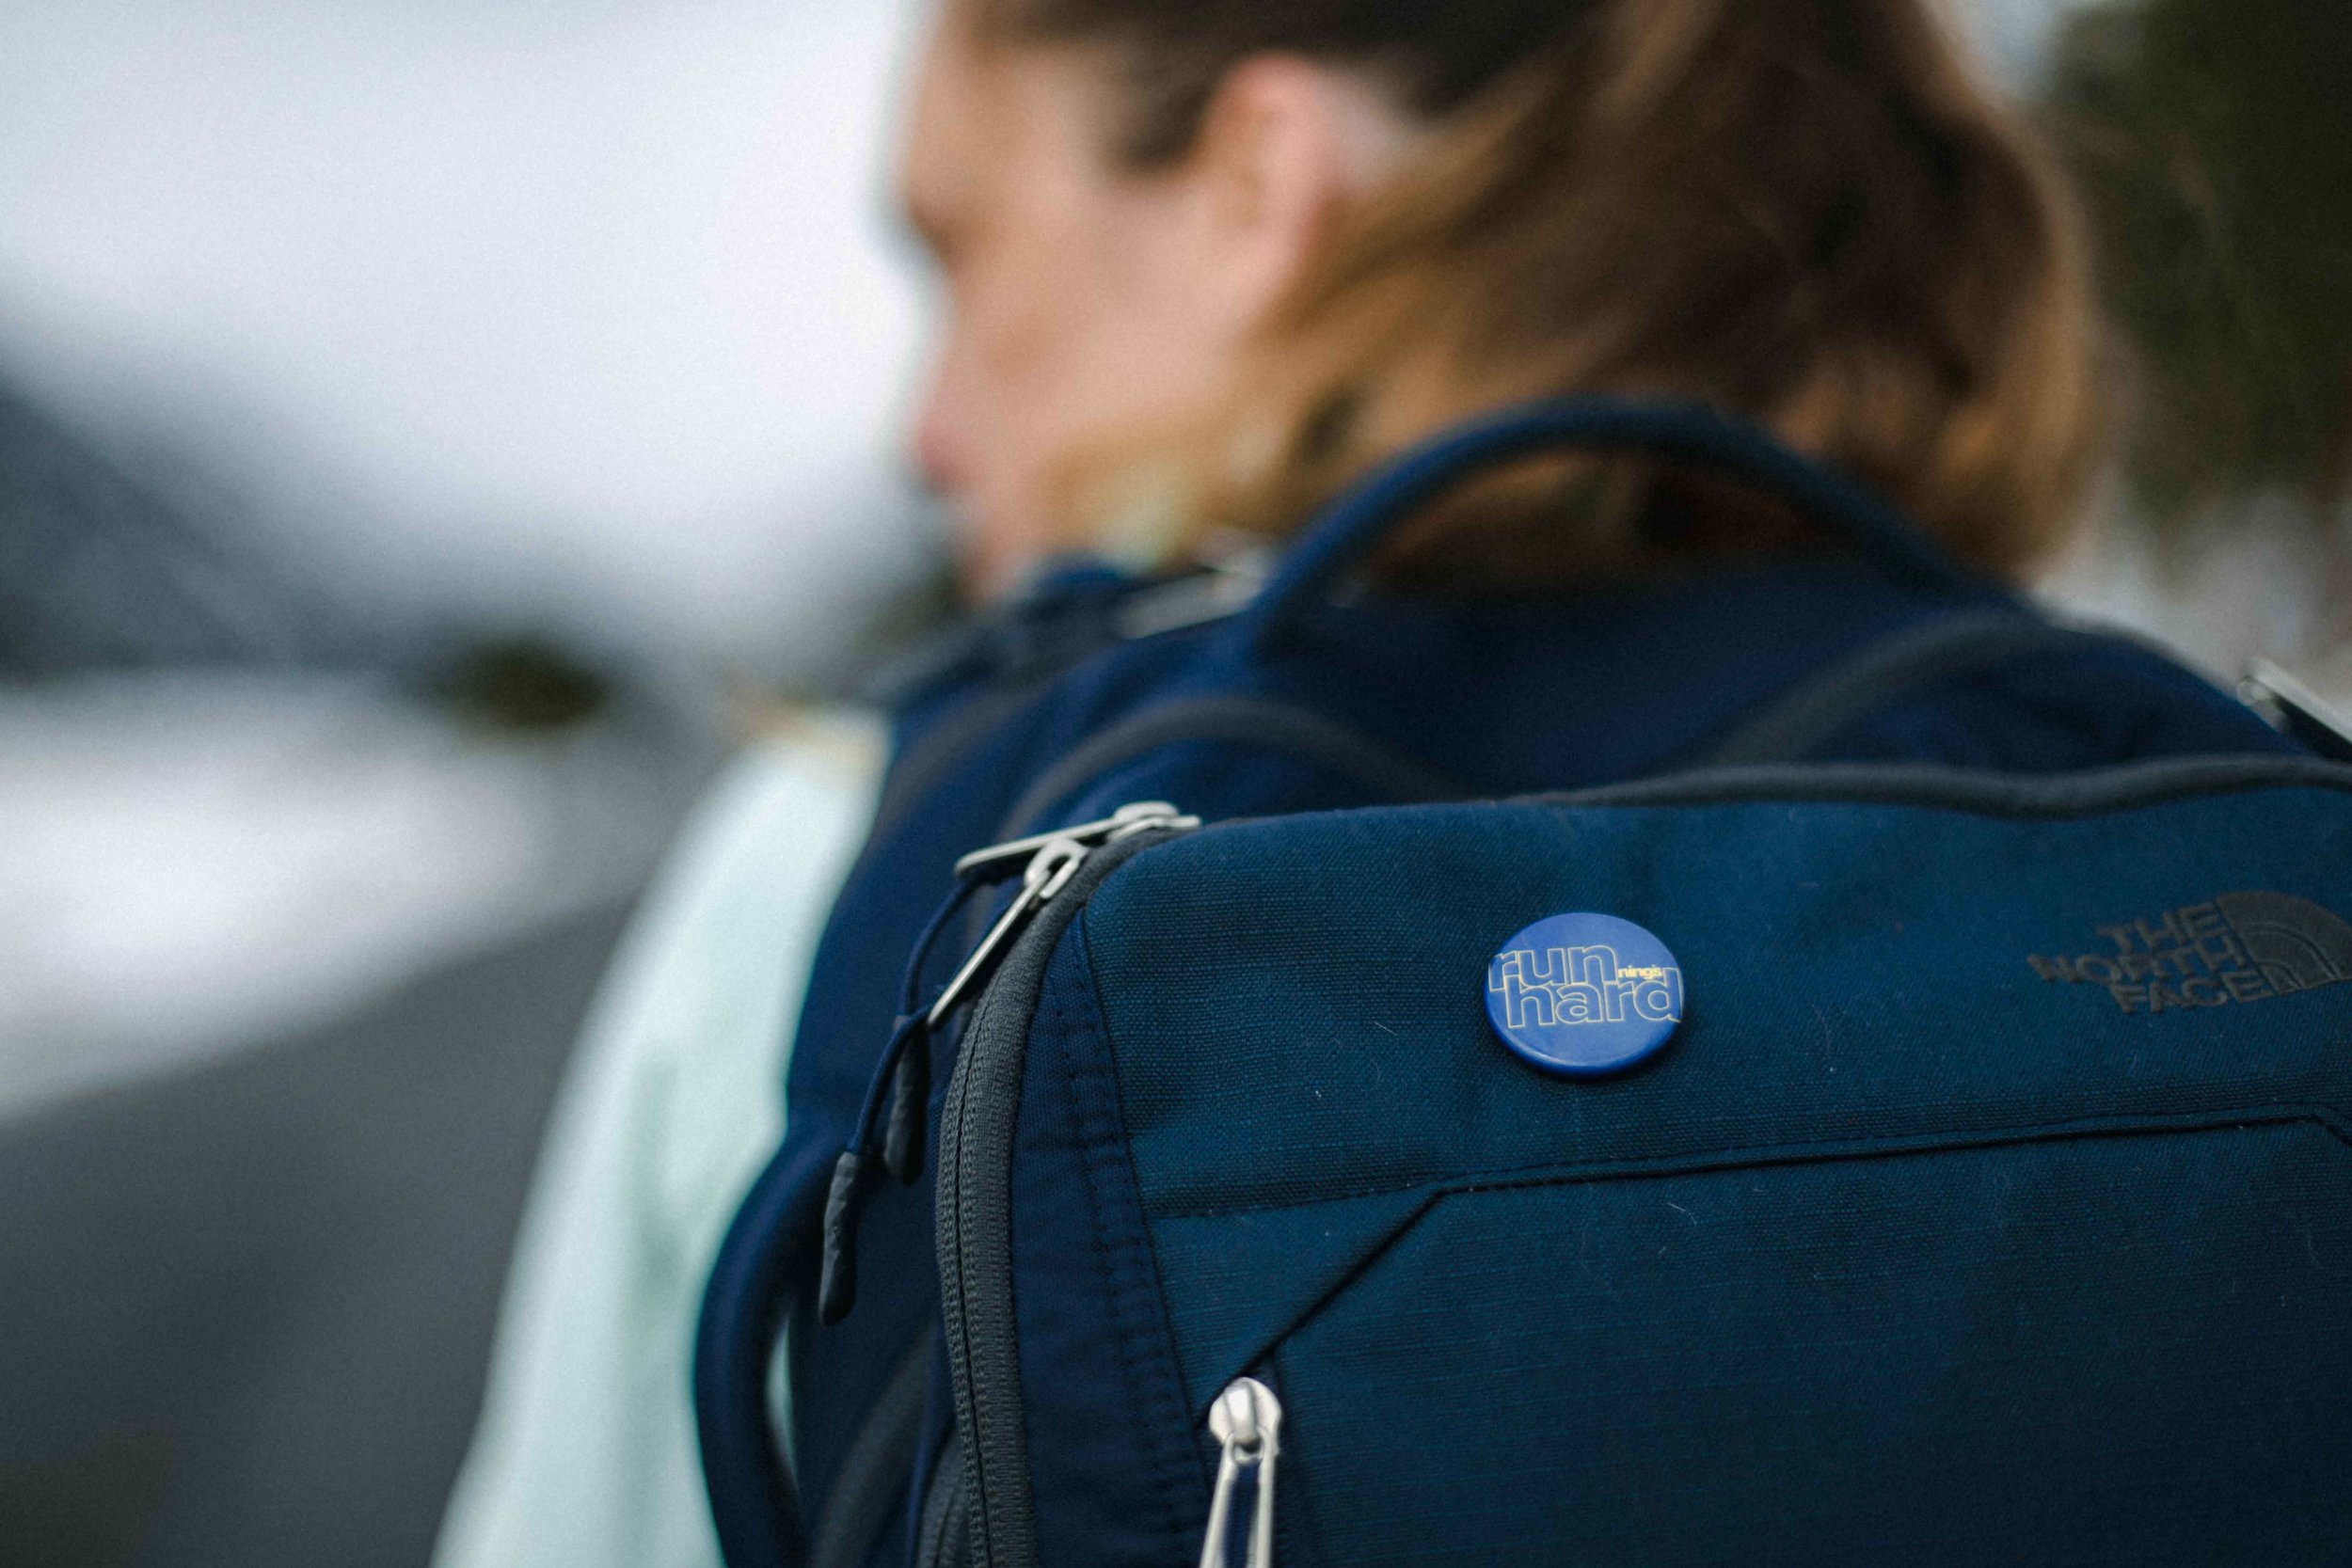 Training Bag Pins - Boston Edition